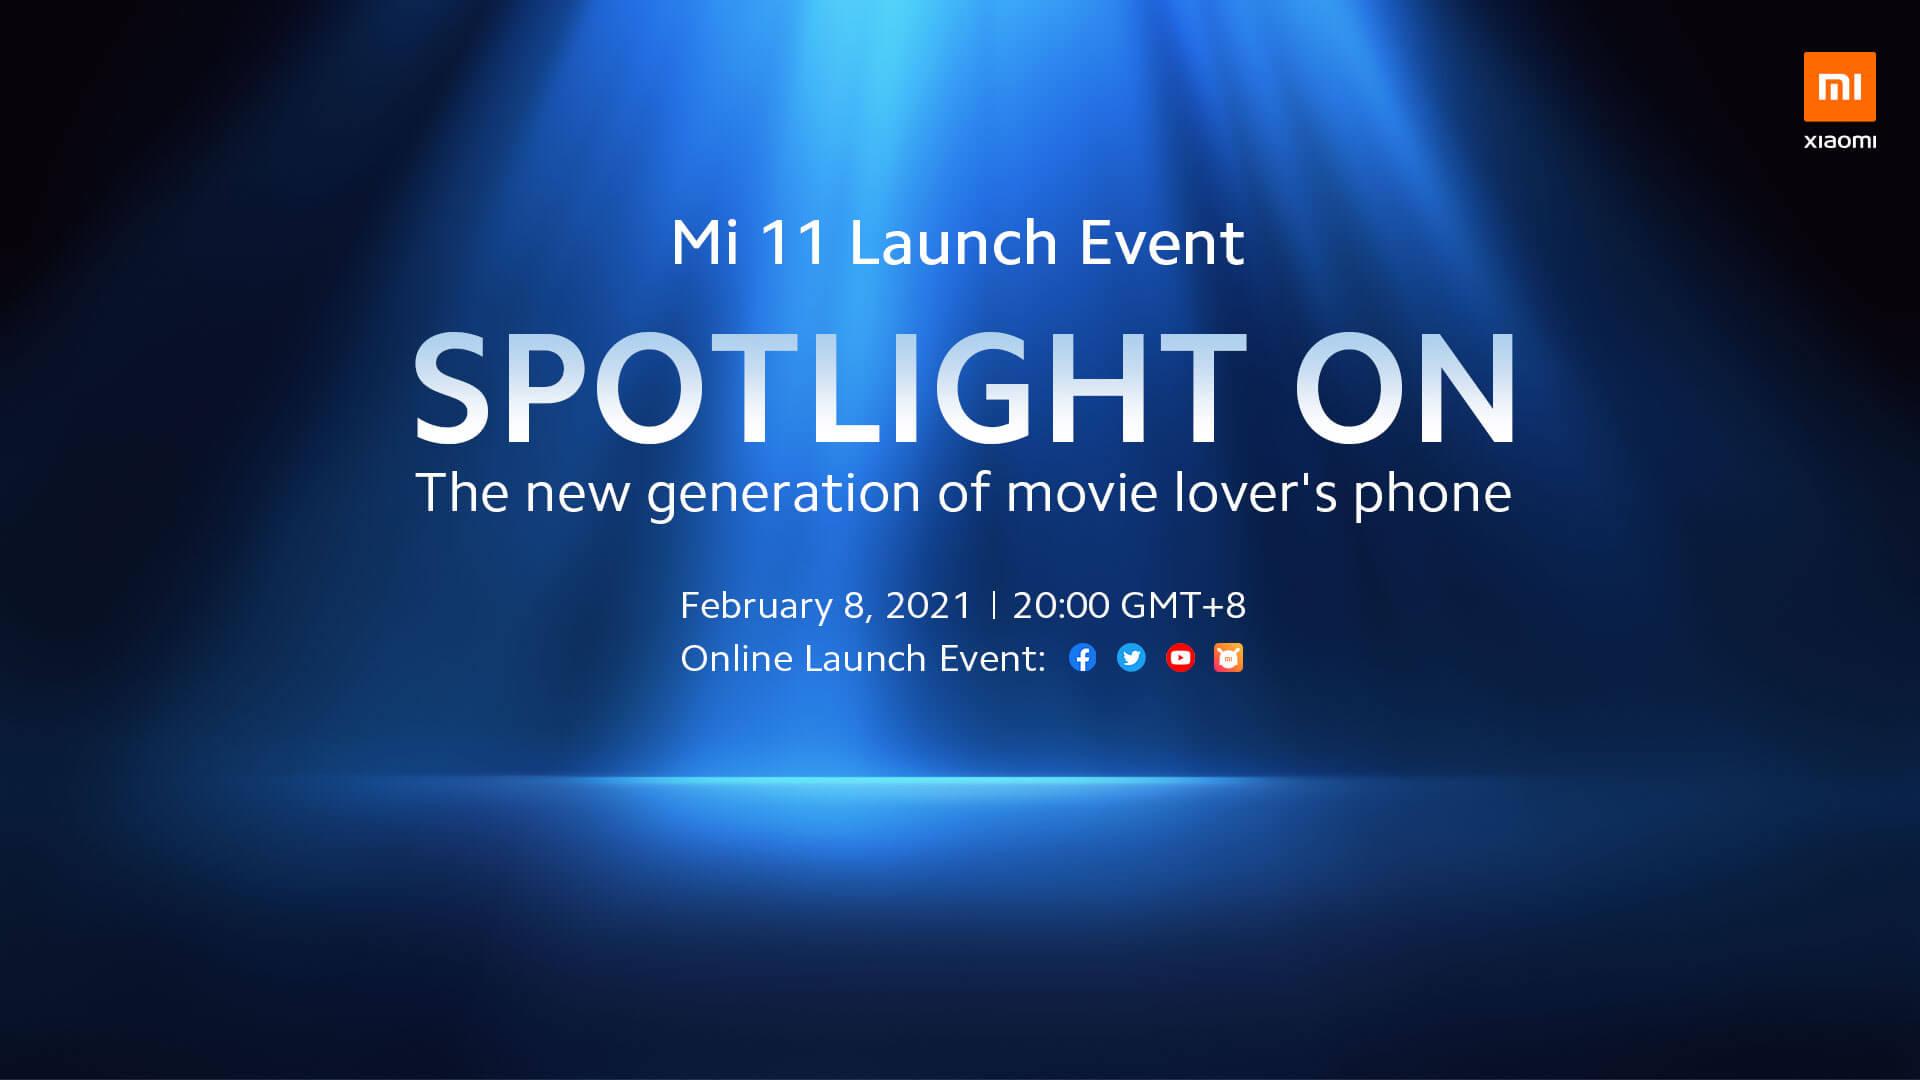 Xiaomi Mi 11 Global model